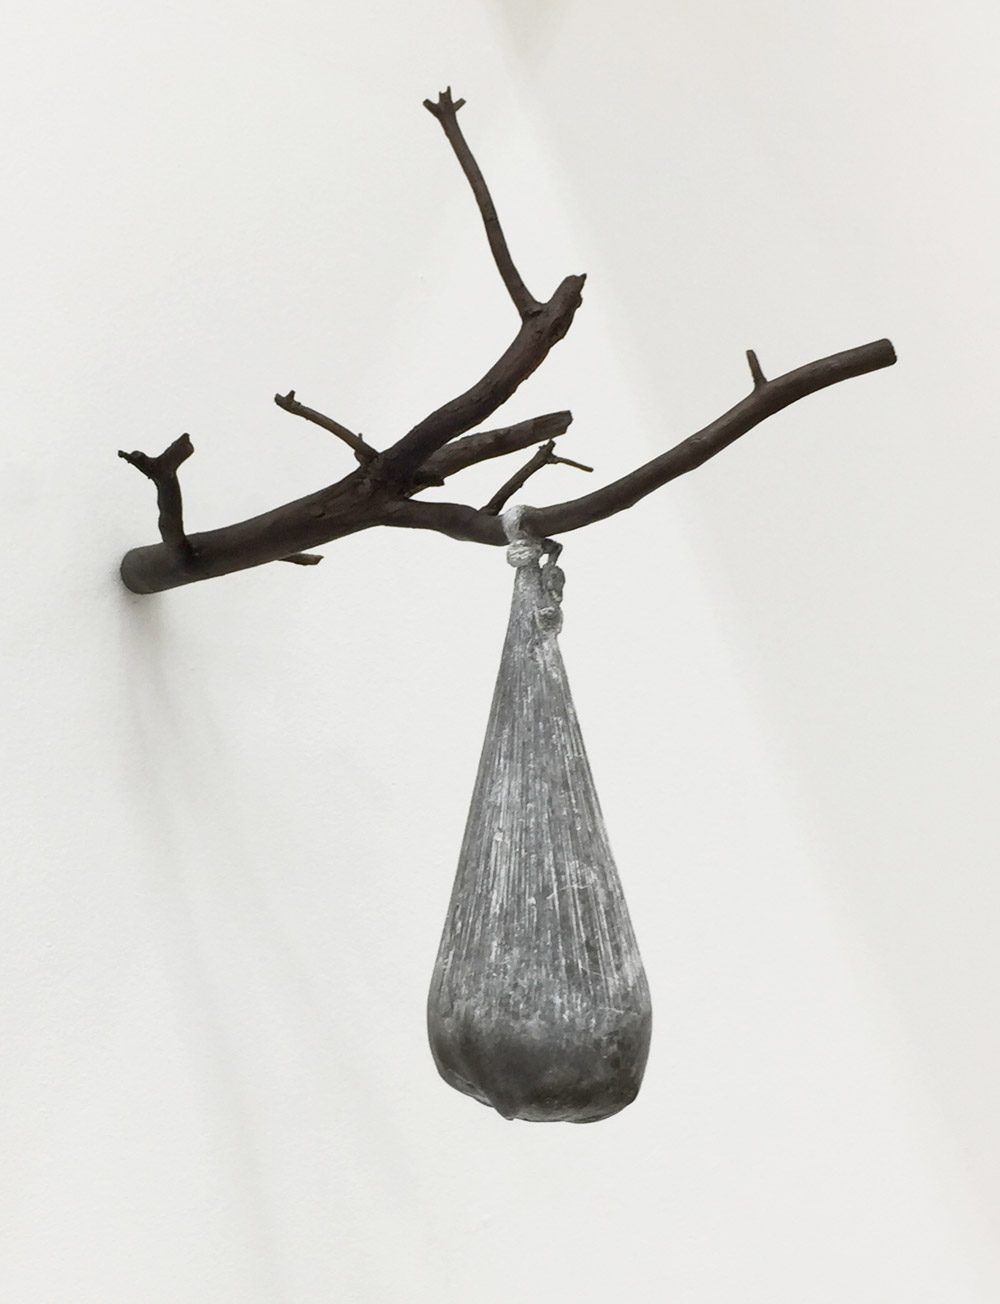 o. T. 3 (2016), Bronze, 55 x 55 x 30 cm